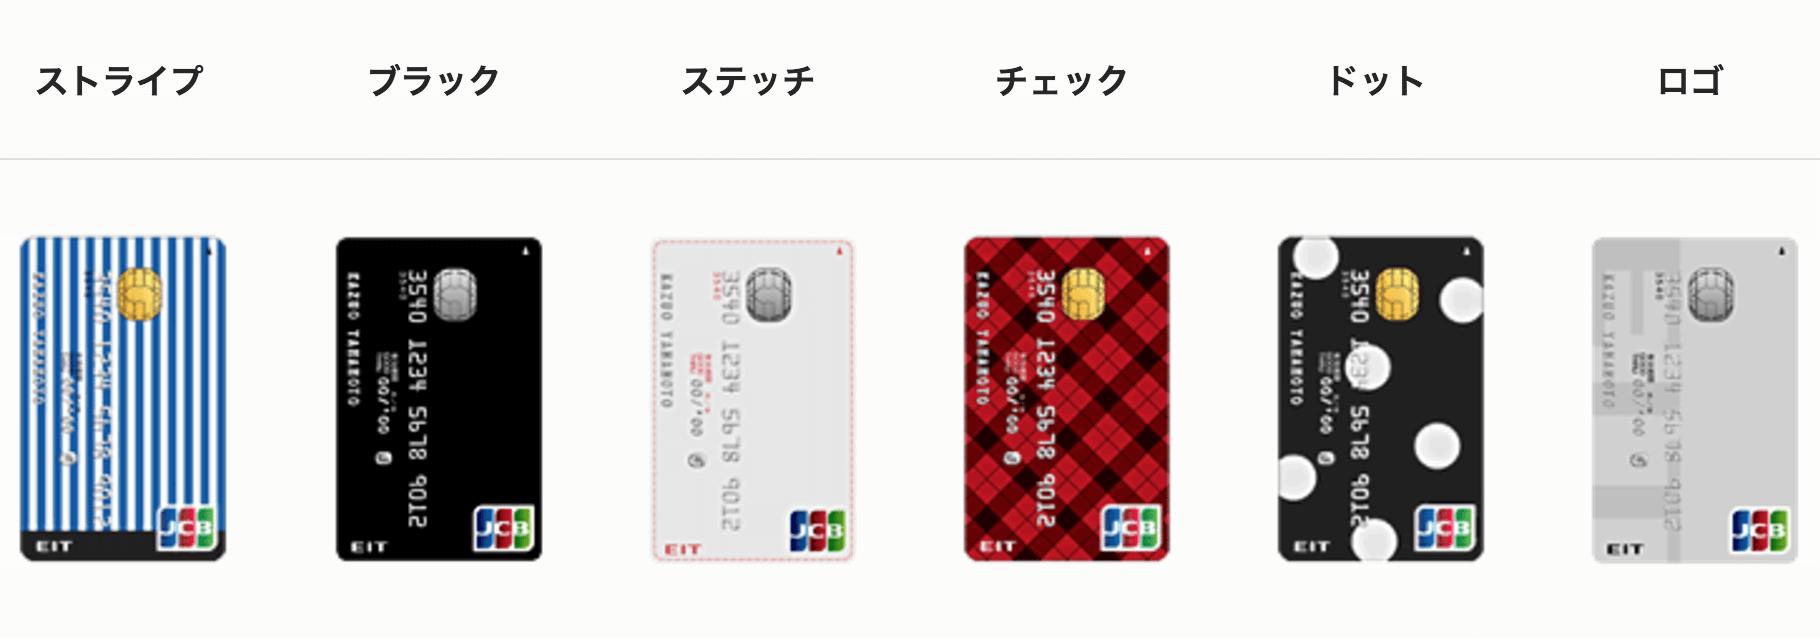 JCB EIT(リボ払い専用カード)